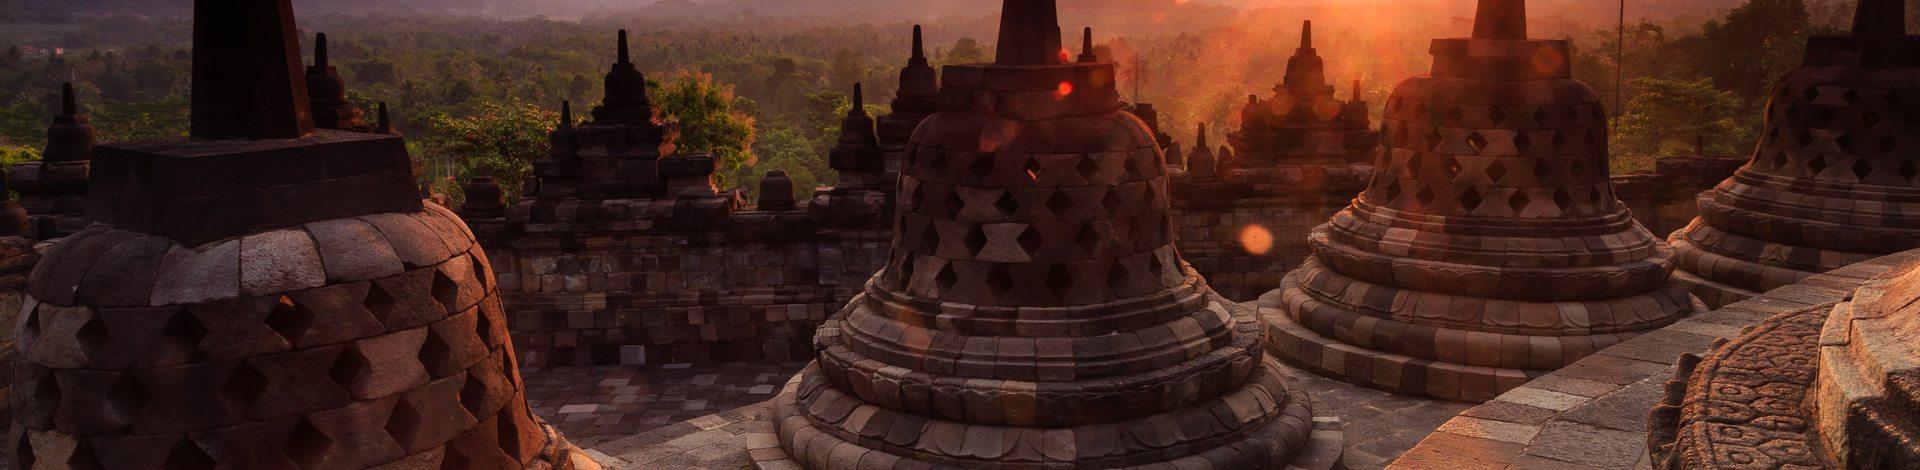 Java Borobudur Unesco temple bouddhiste